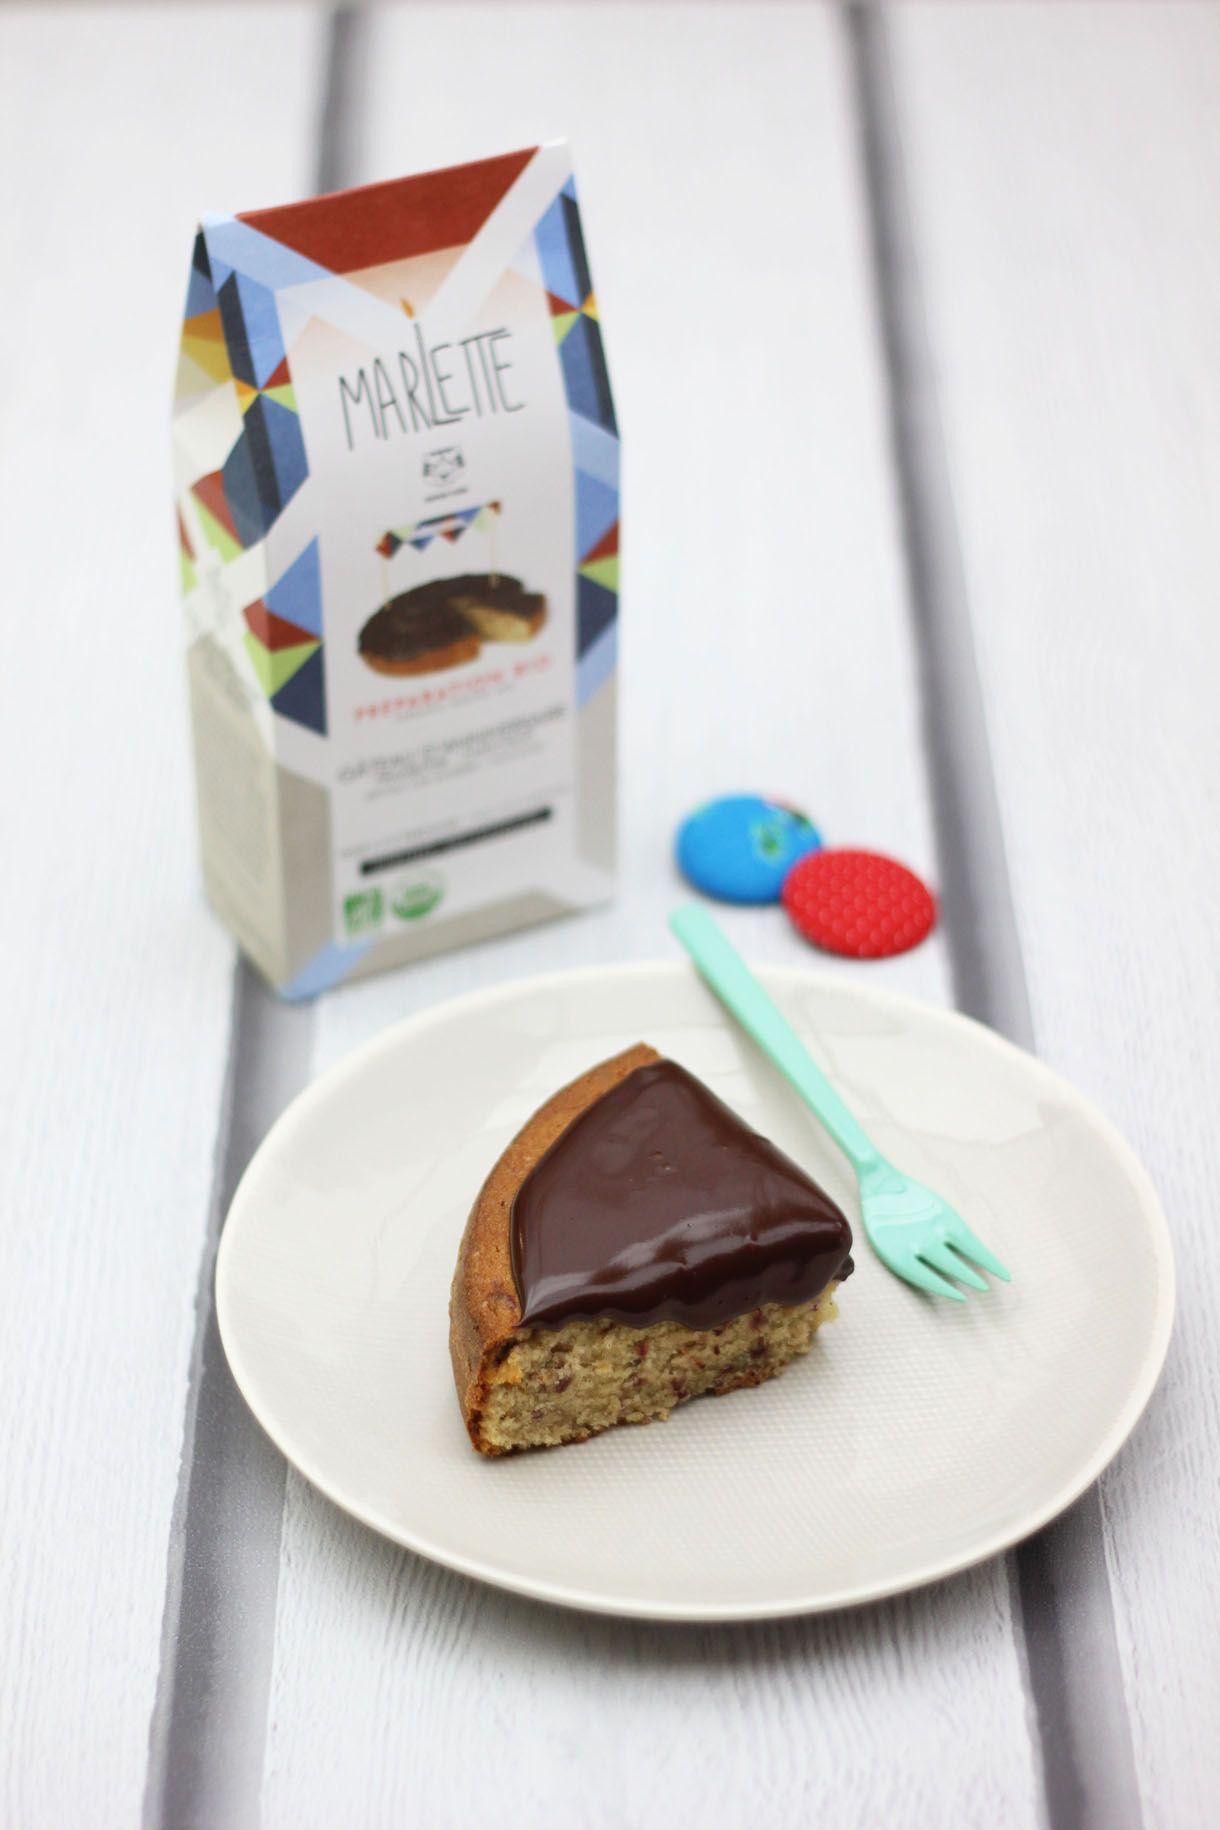 Gâteaux Marlette